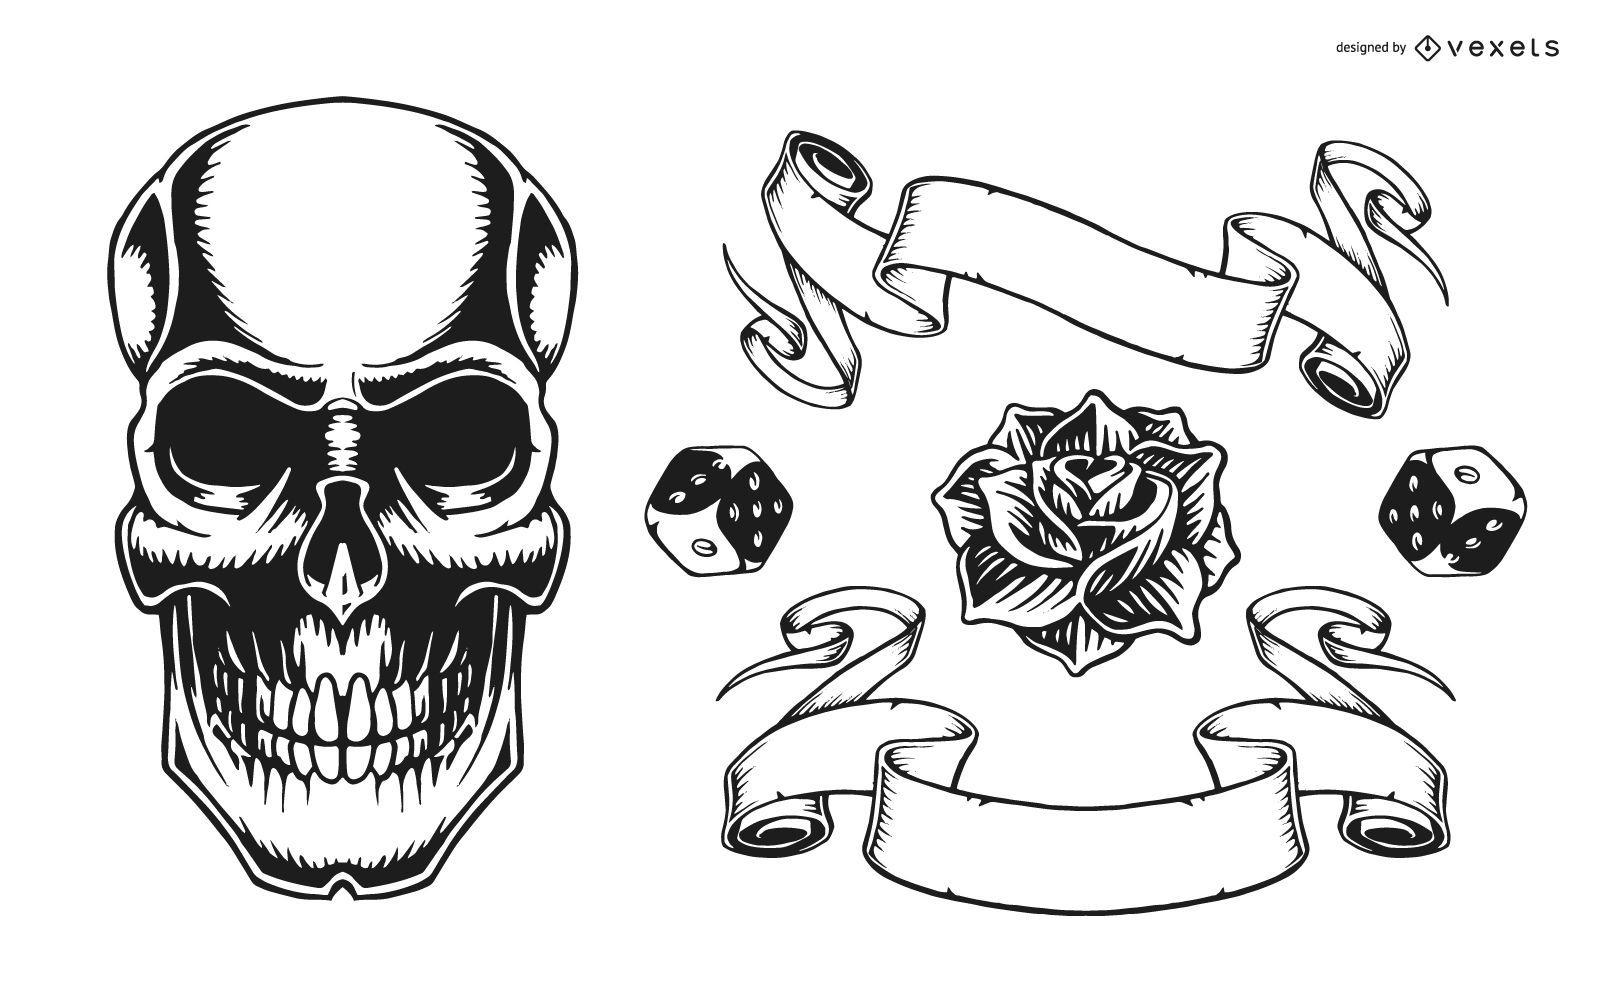 Vintage tattoo graphic set